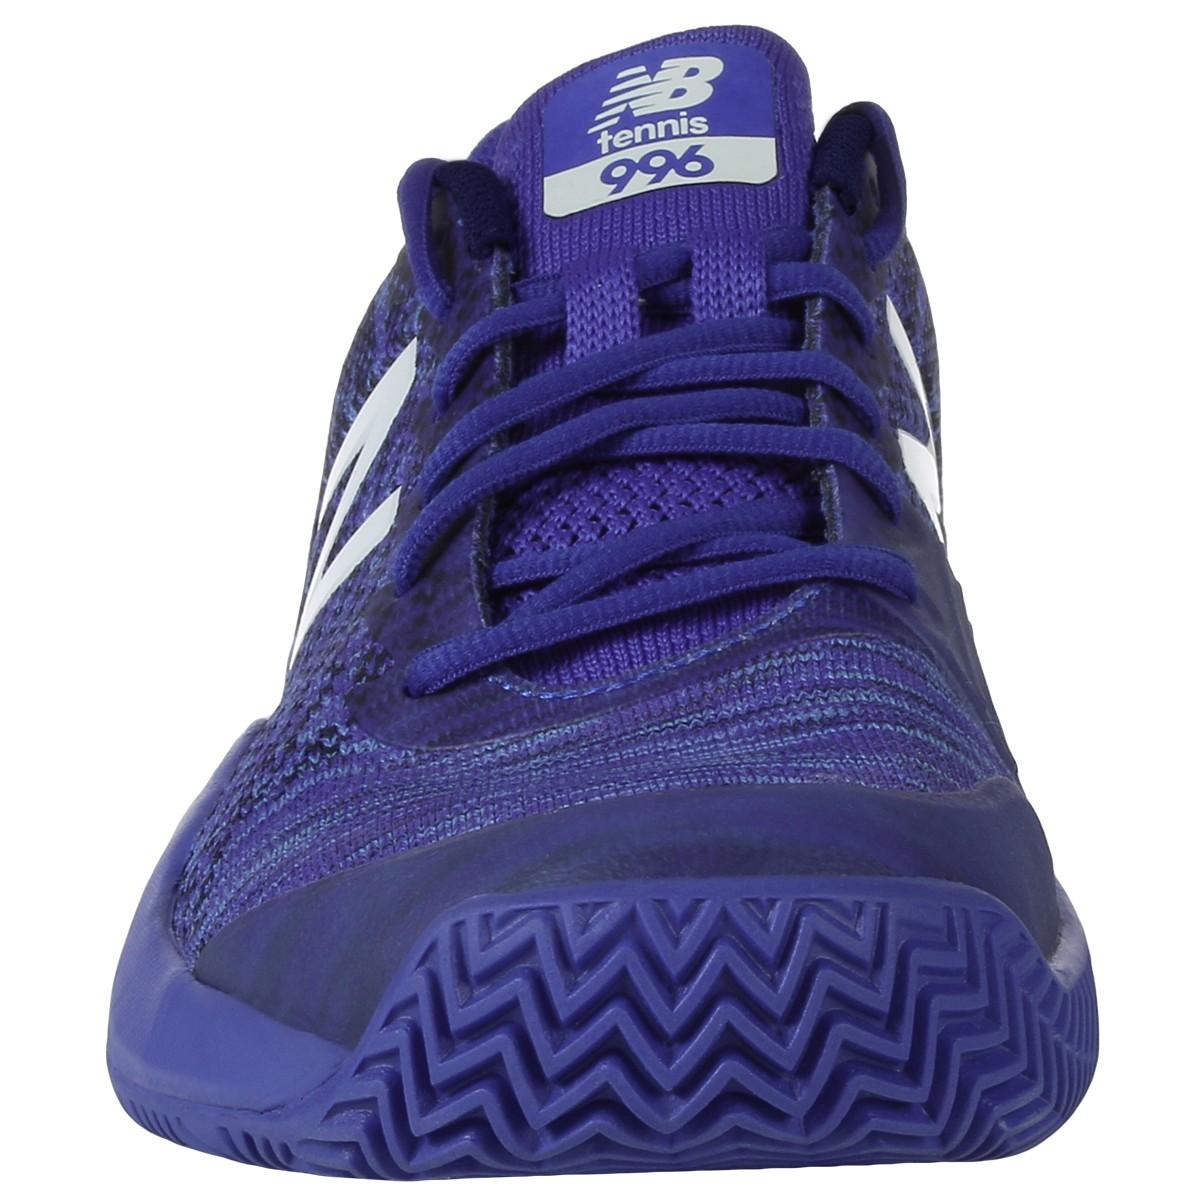 Chaussures New Balance Femme 996 V3 All Court